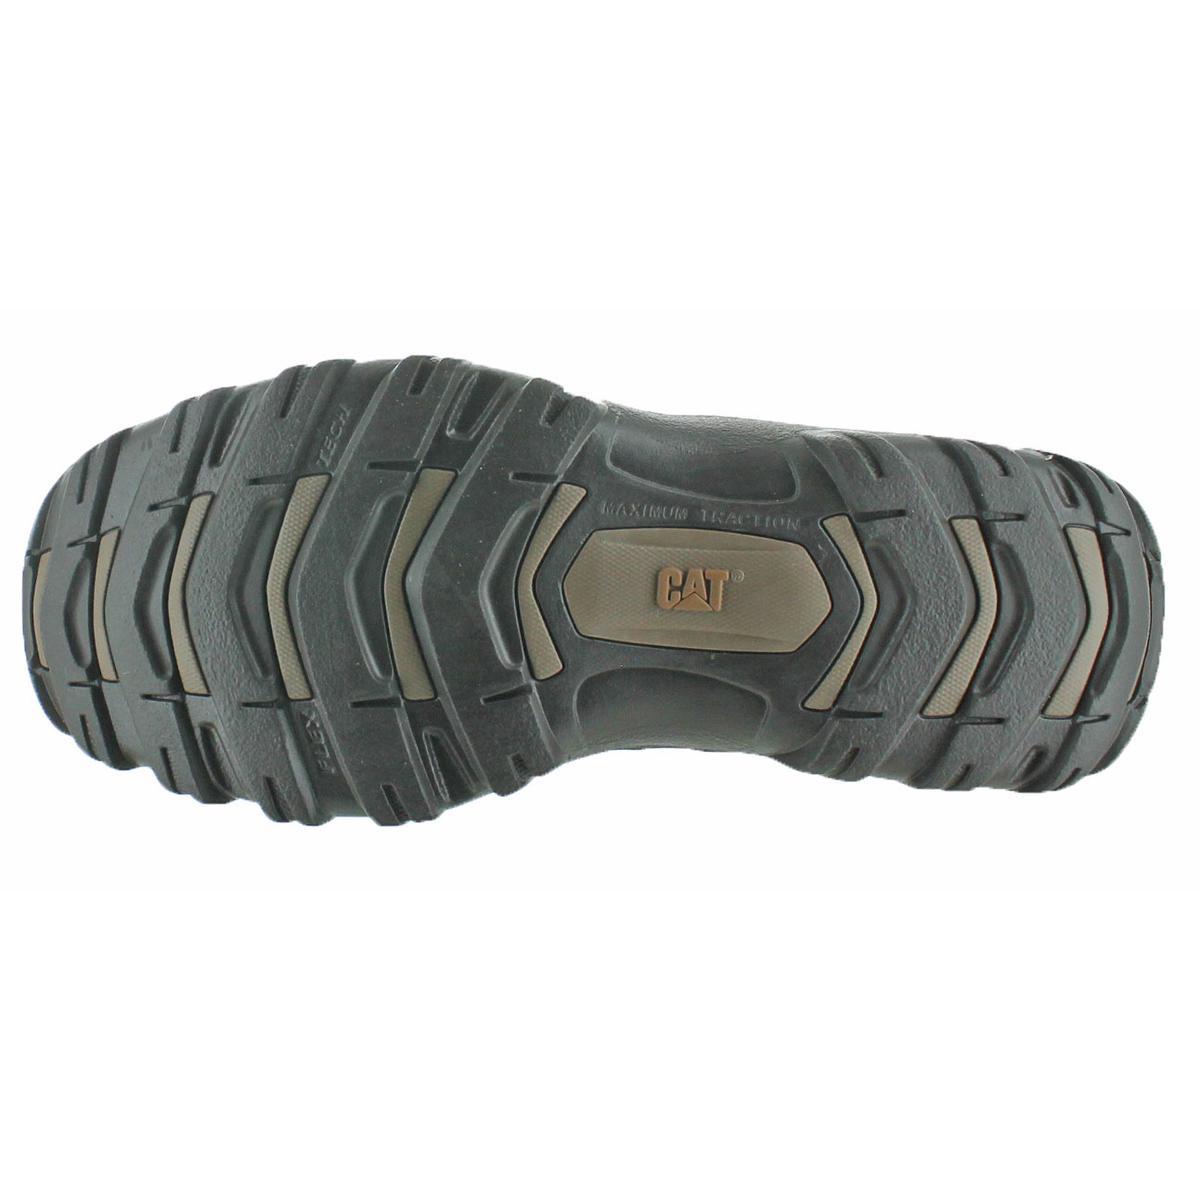 9055fa3a3e6c6 Details about CAT Caterpillar Transform Men's Ankle Fashion Boots Leather